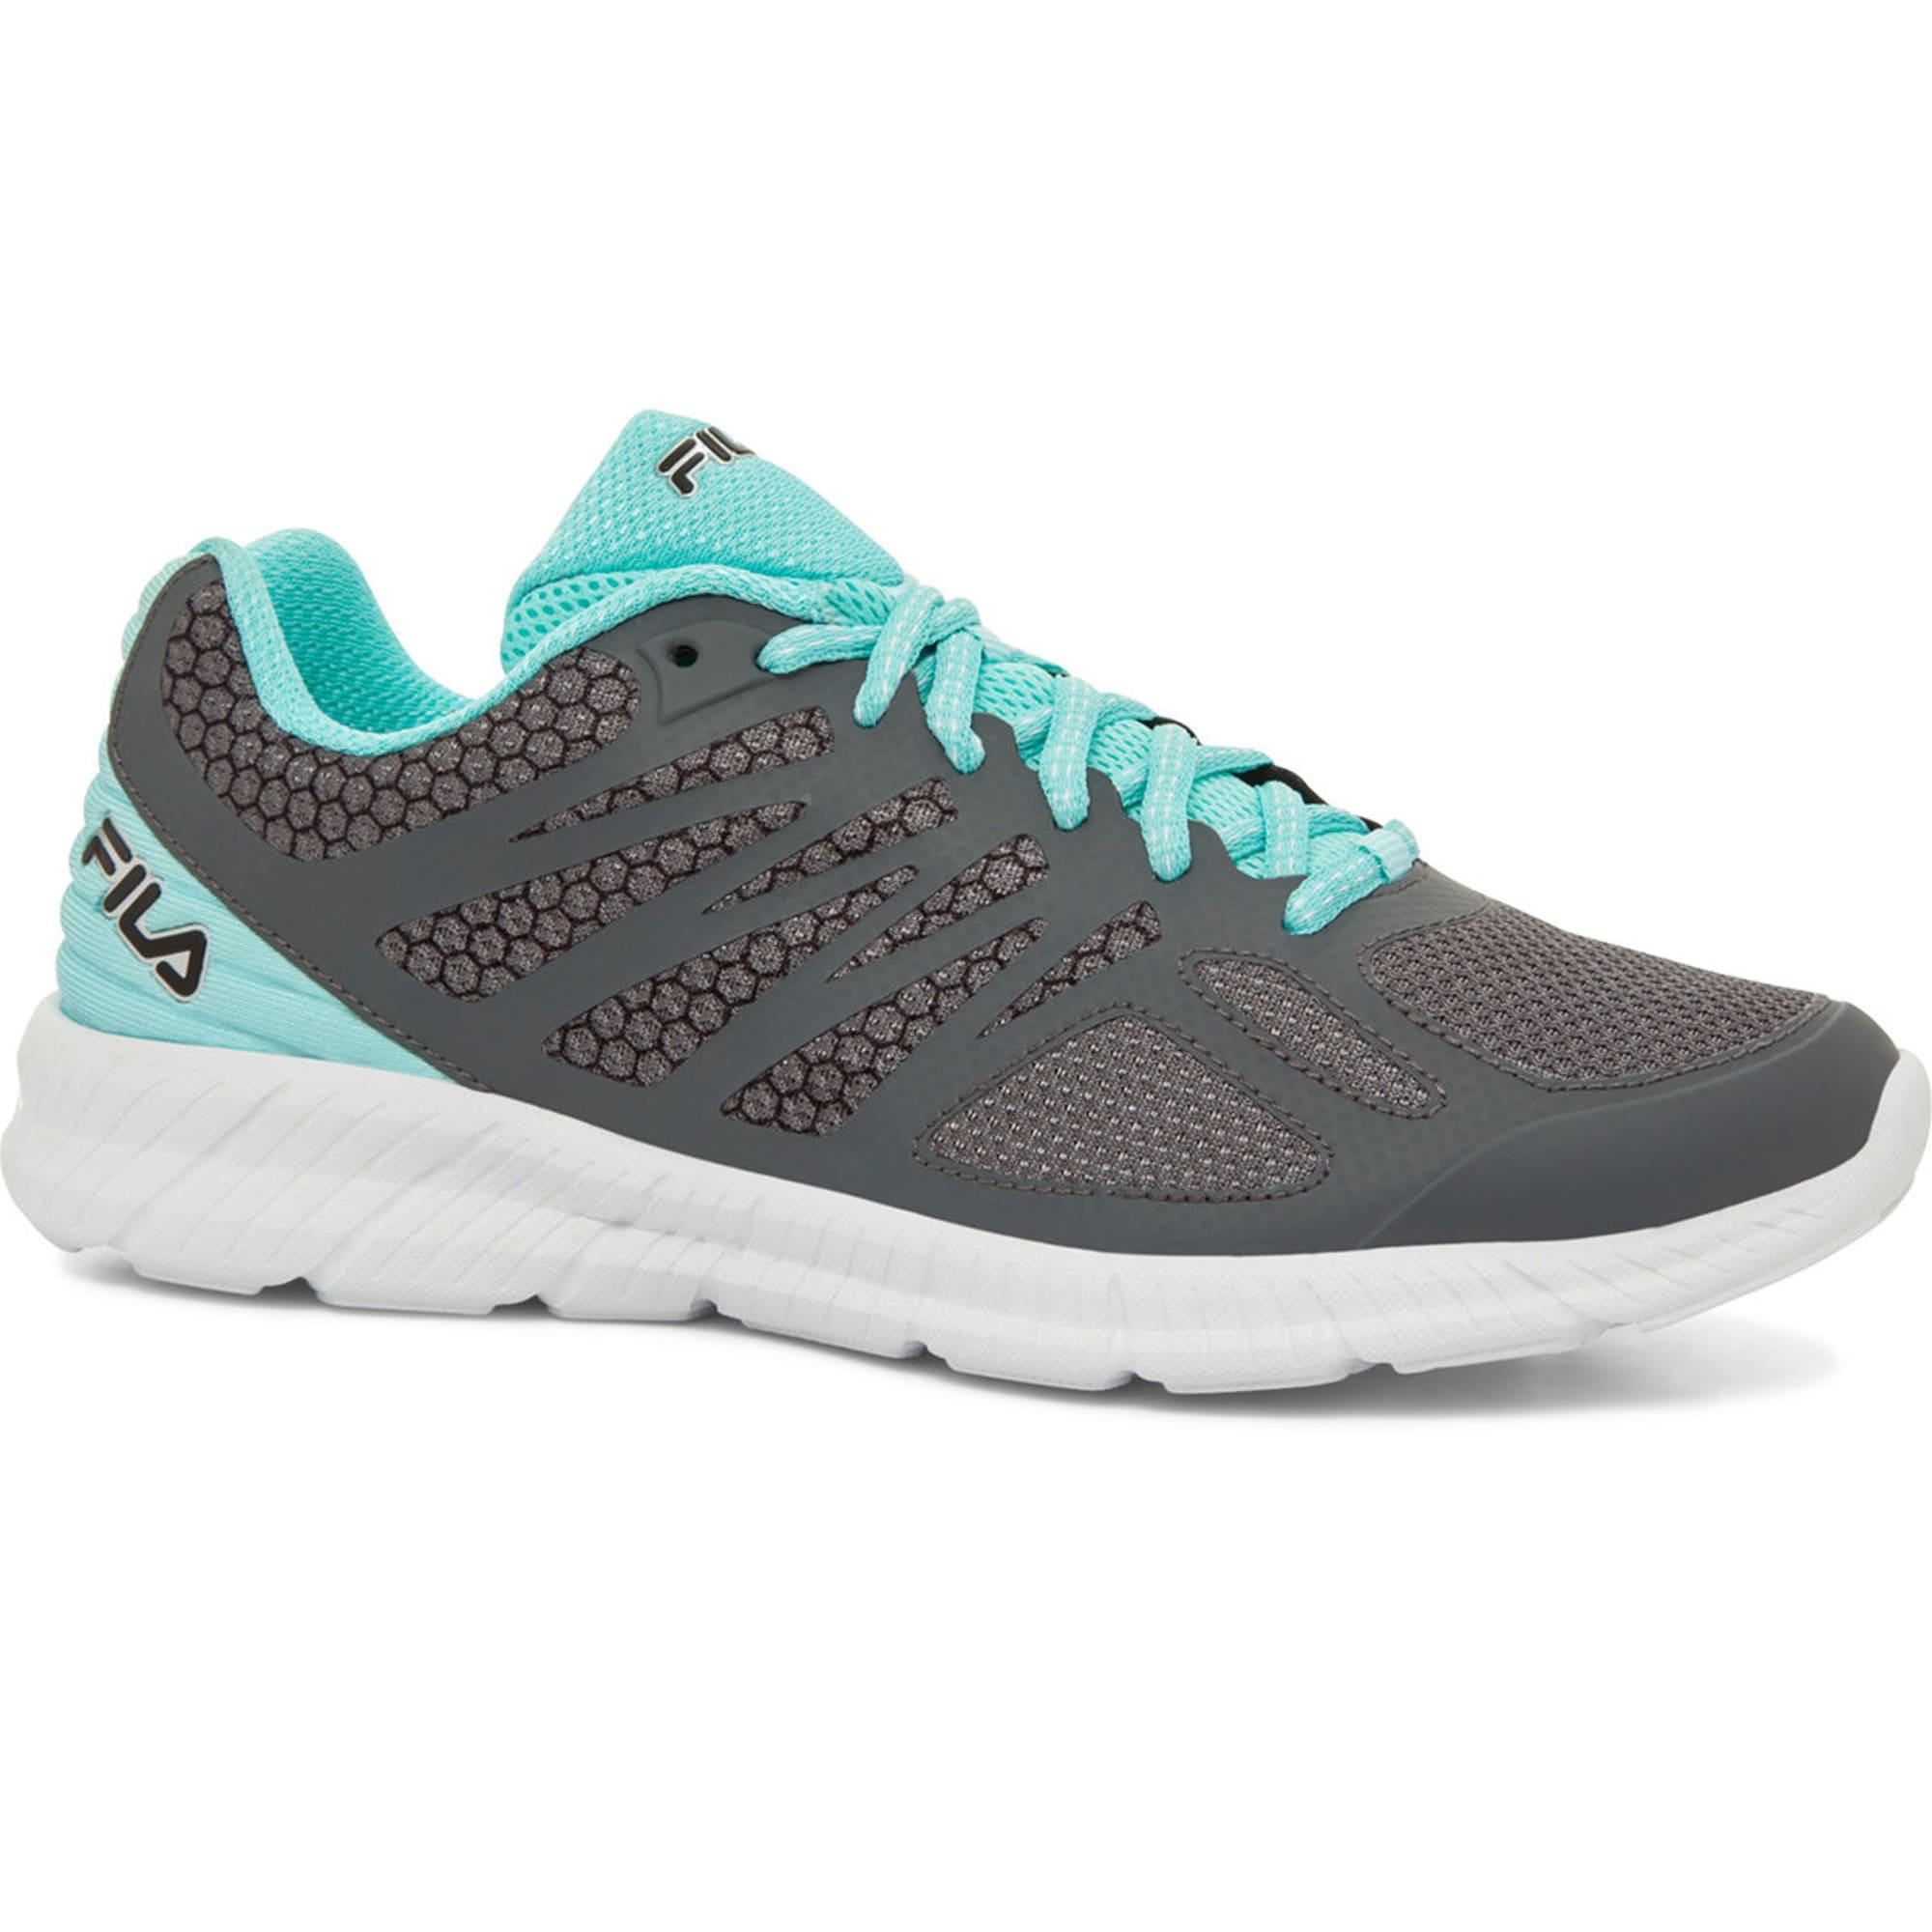 FILA Women's Memory Speedstride TR Trail Running Shoes